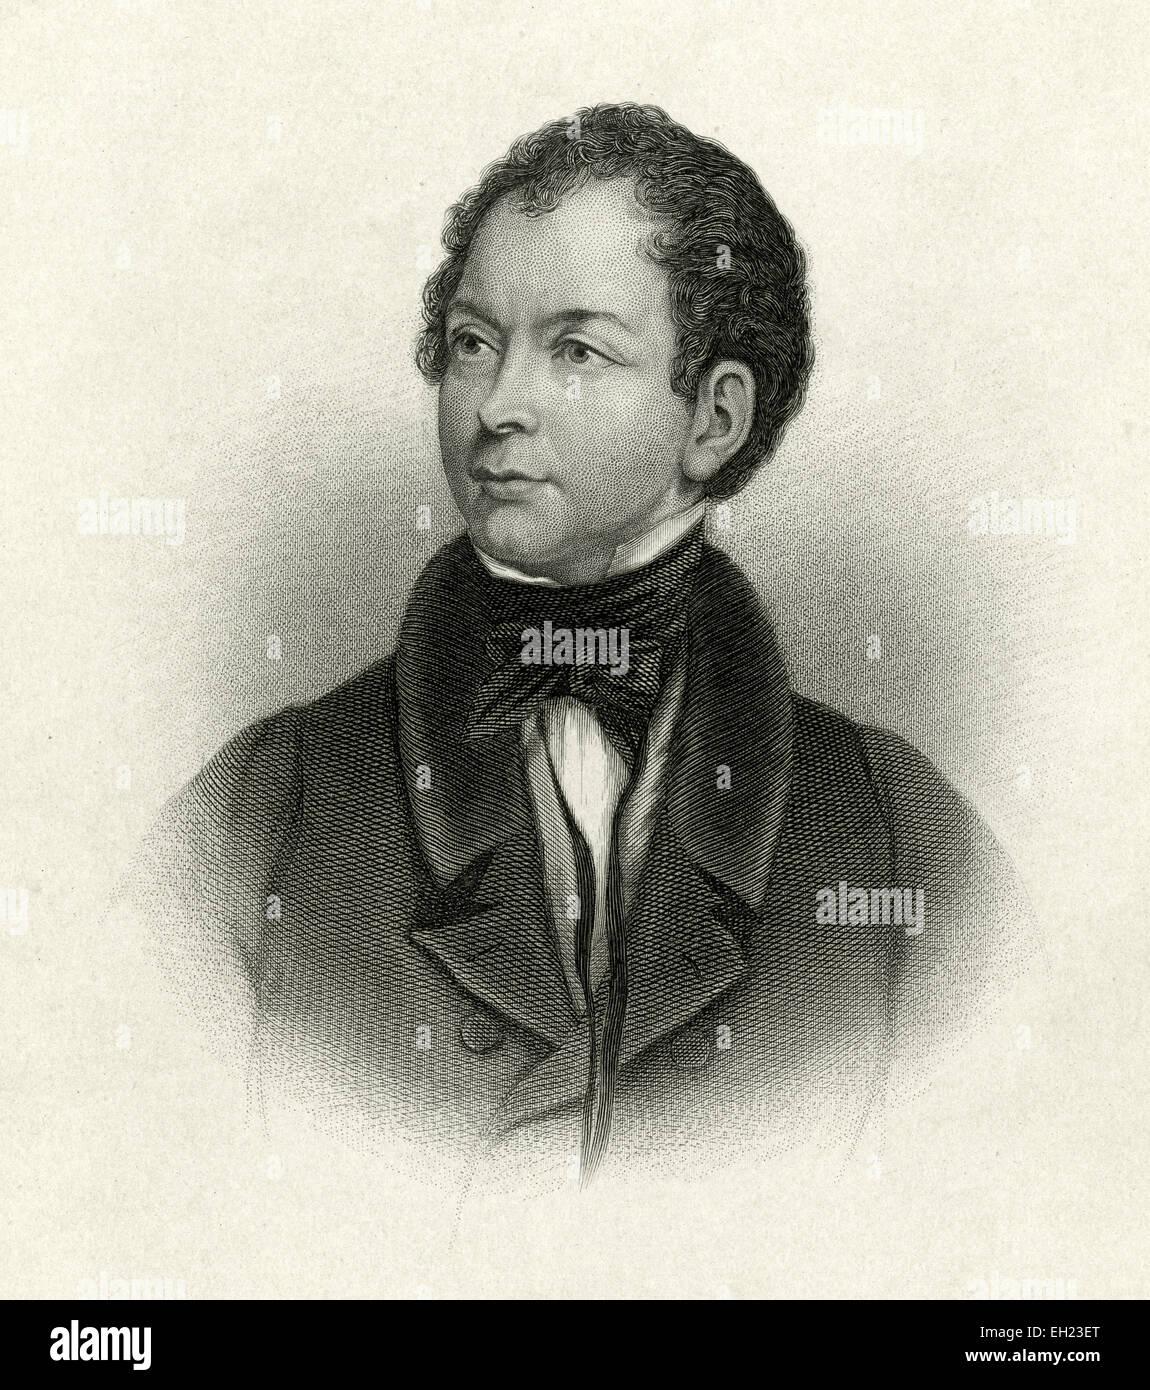 Antique c1885 steel engraving, Thomas Moore. Thomas Moore (28 May 1779 - 25 February 1852) was an Irish poet, singer, - Stock Image